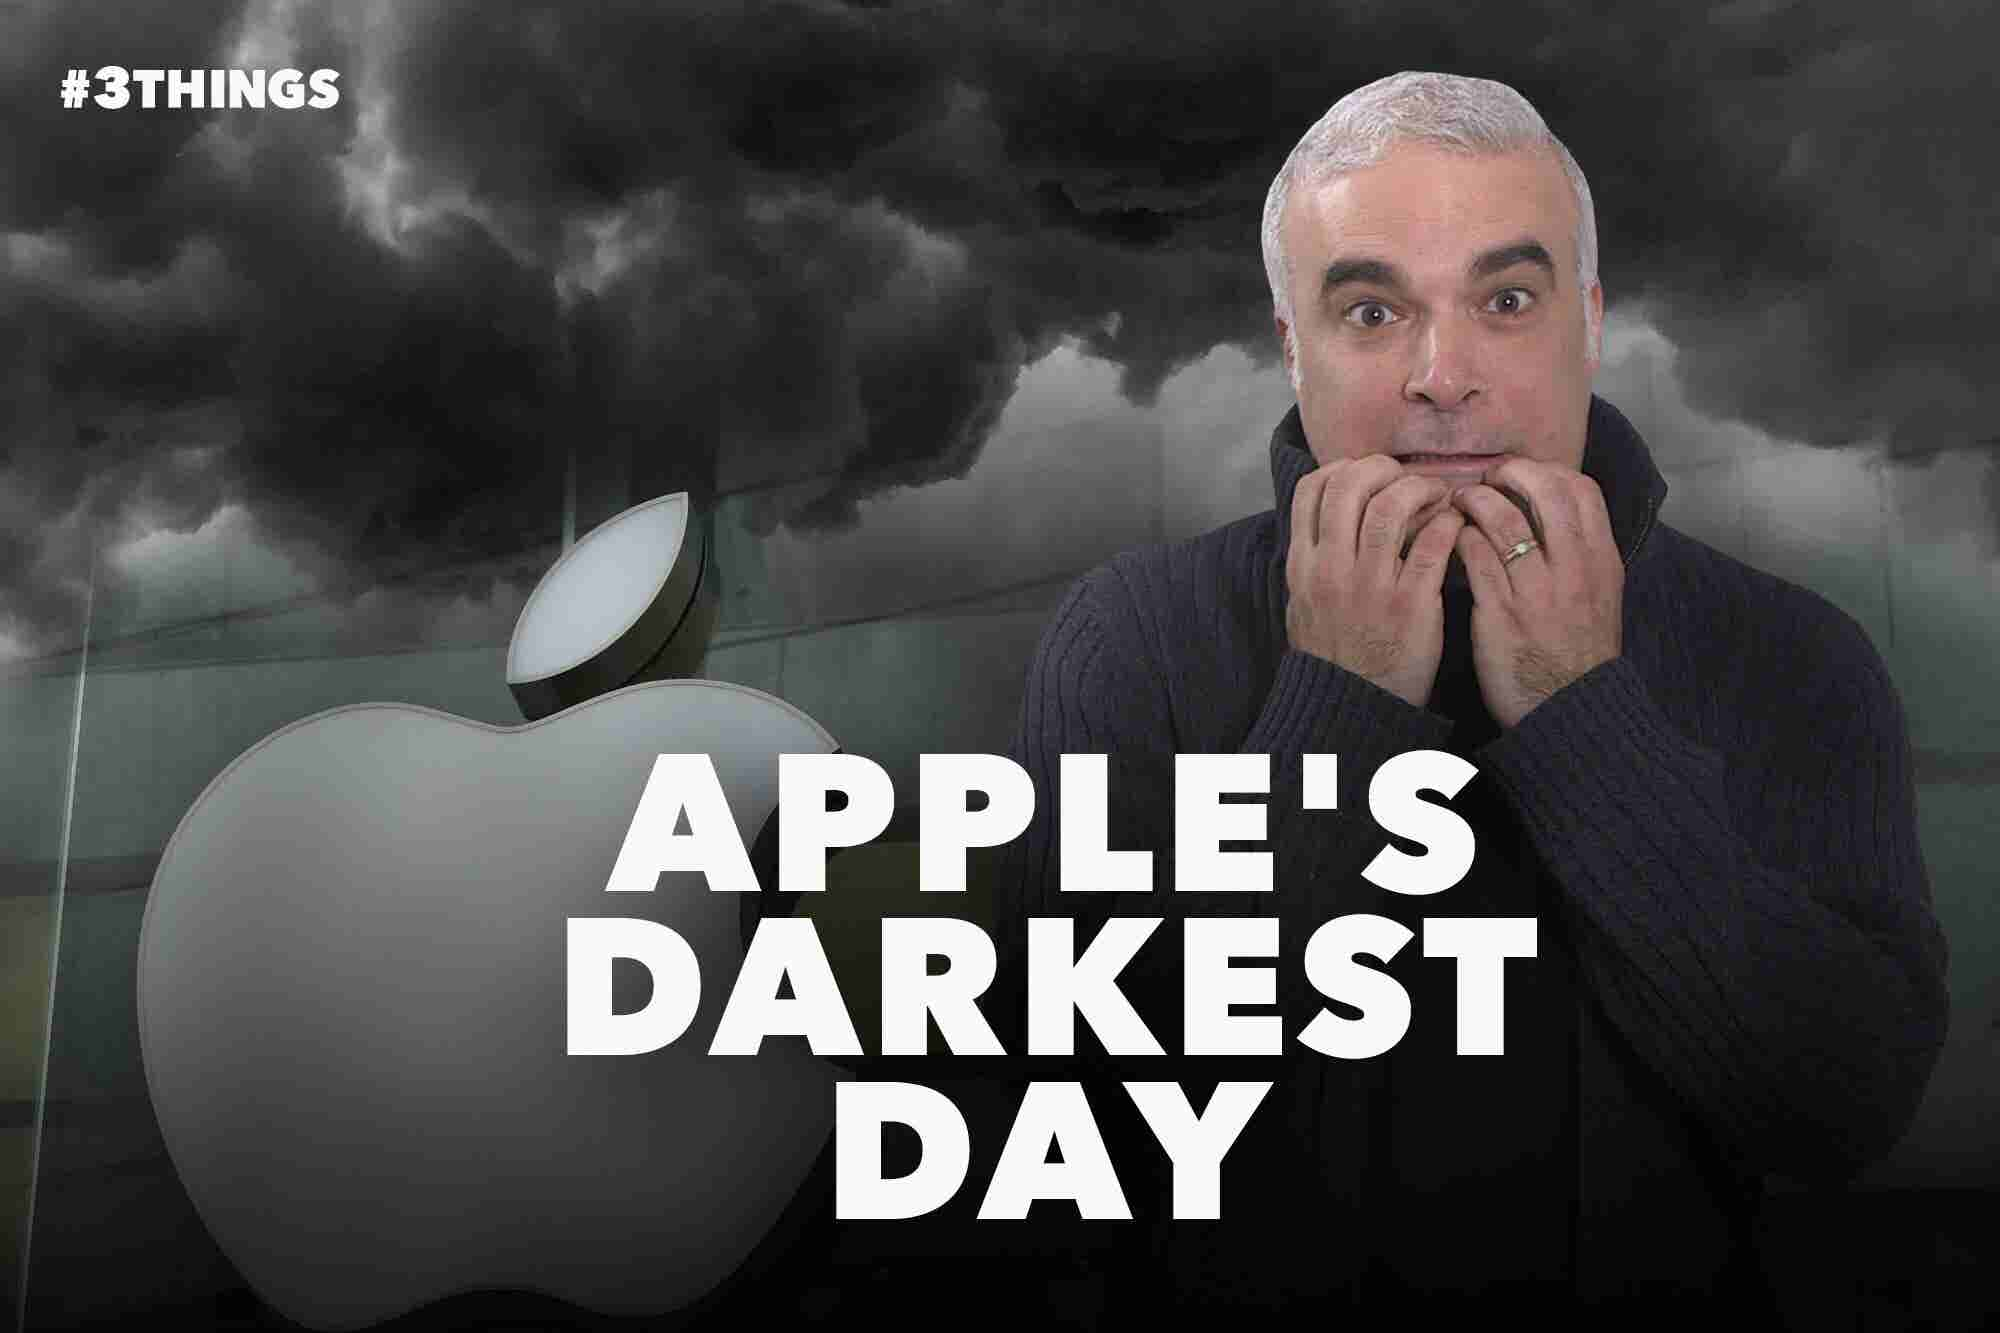 Apple's Darkest Day in the iPhone Era (60-Second Video)